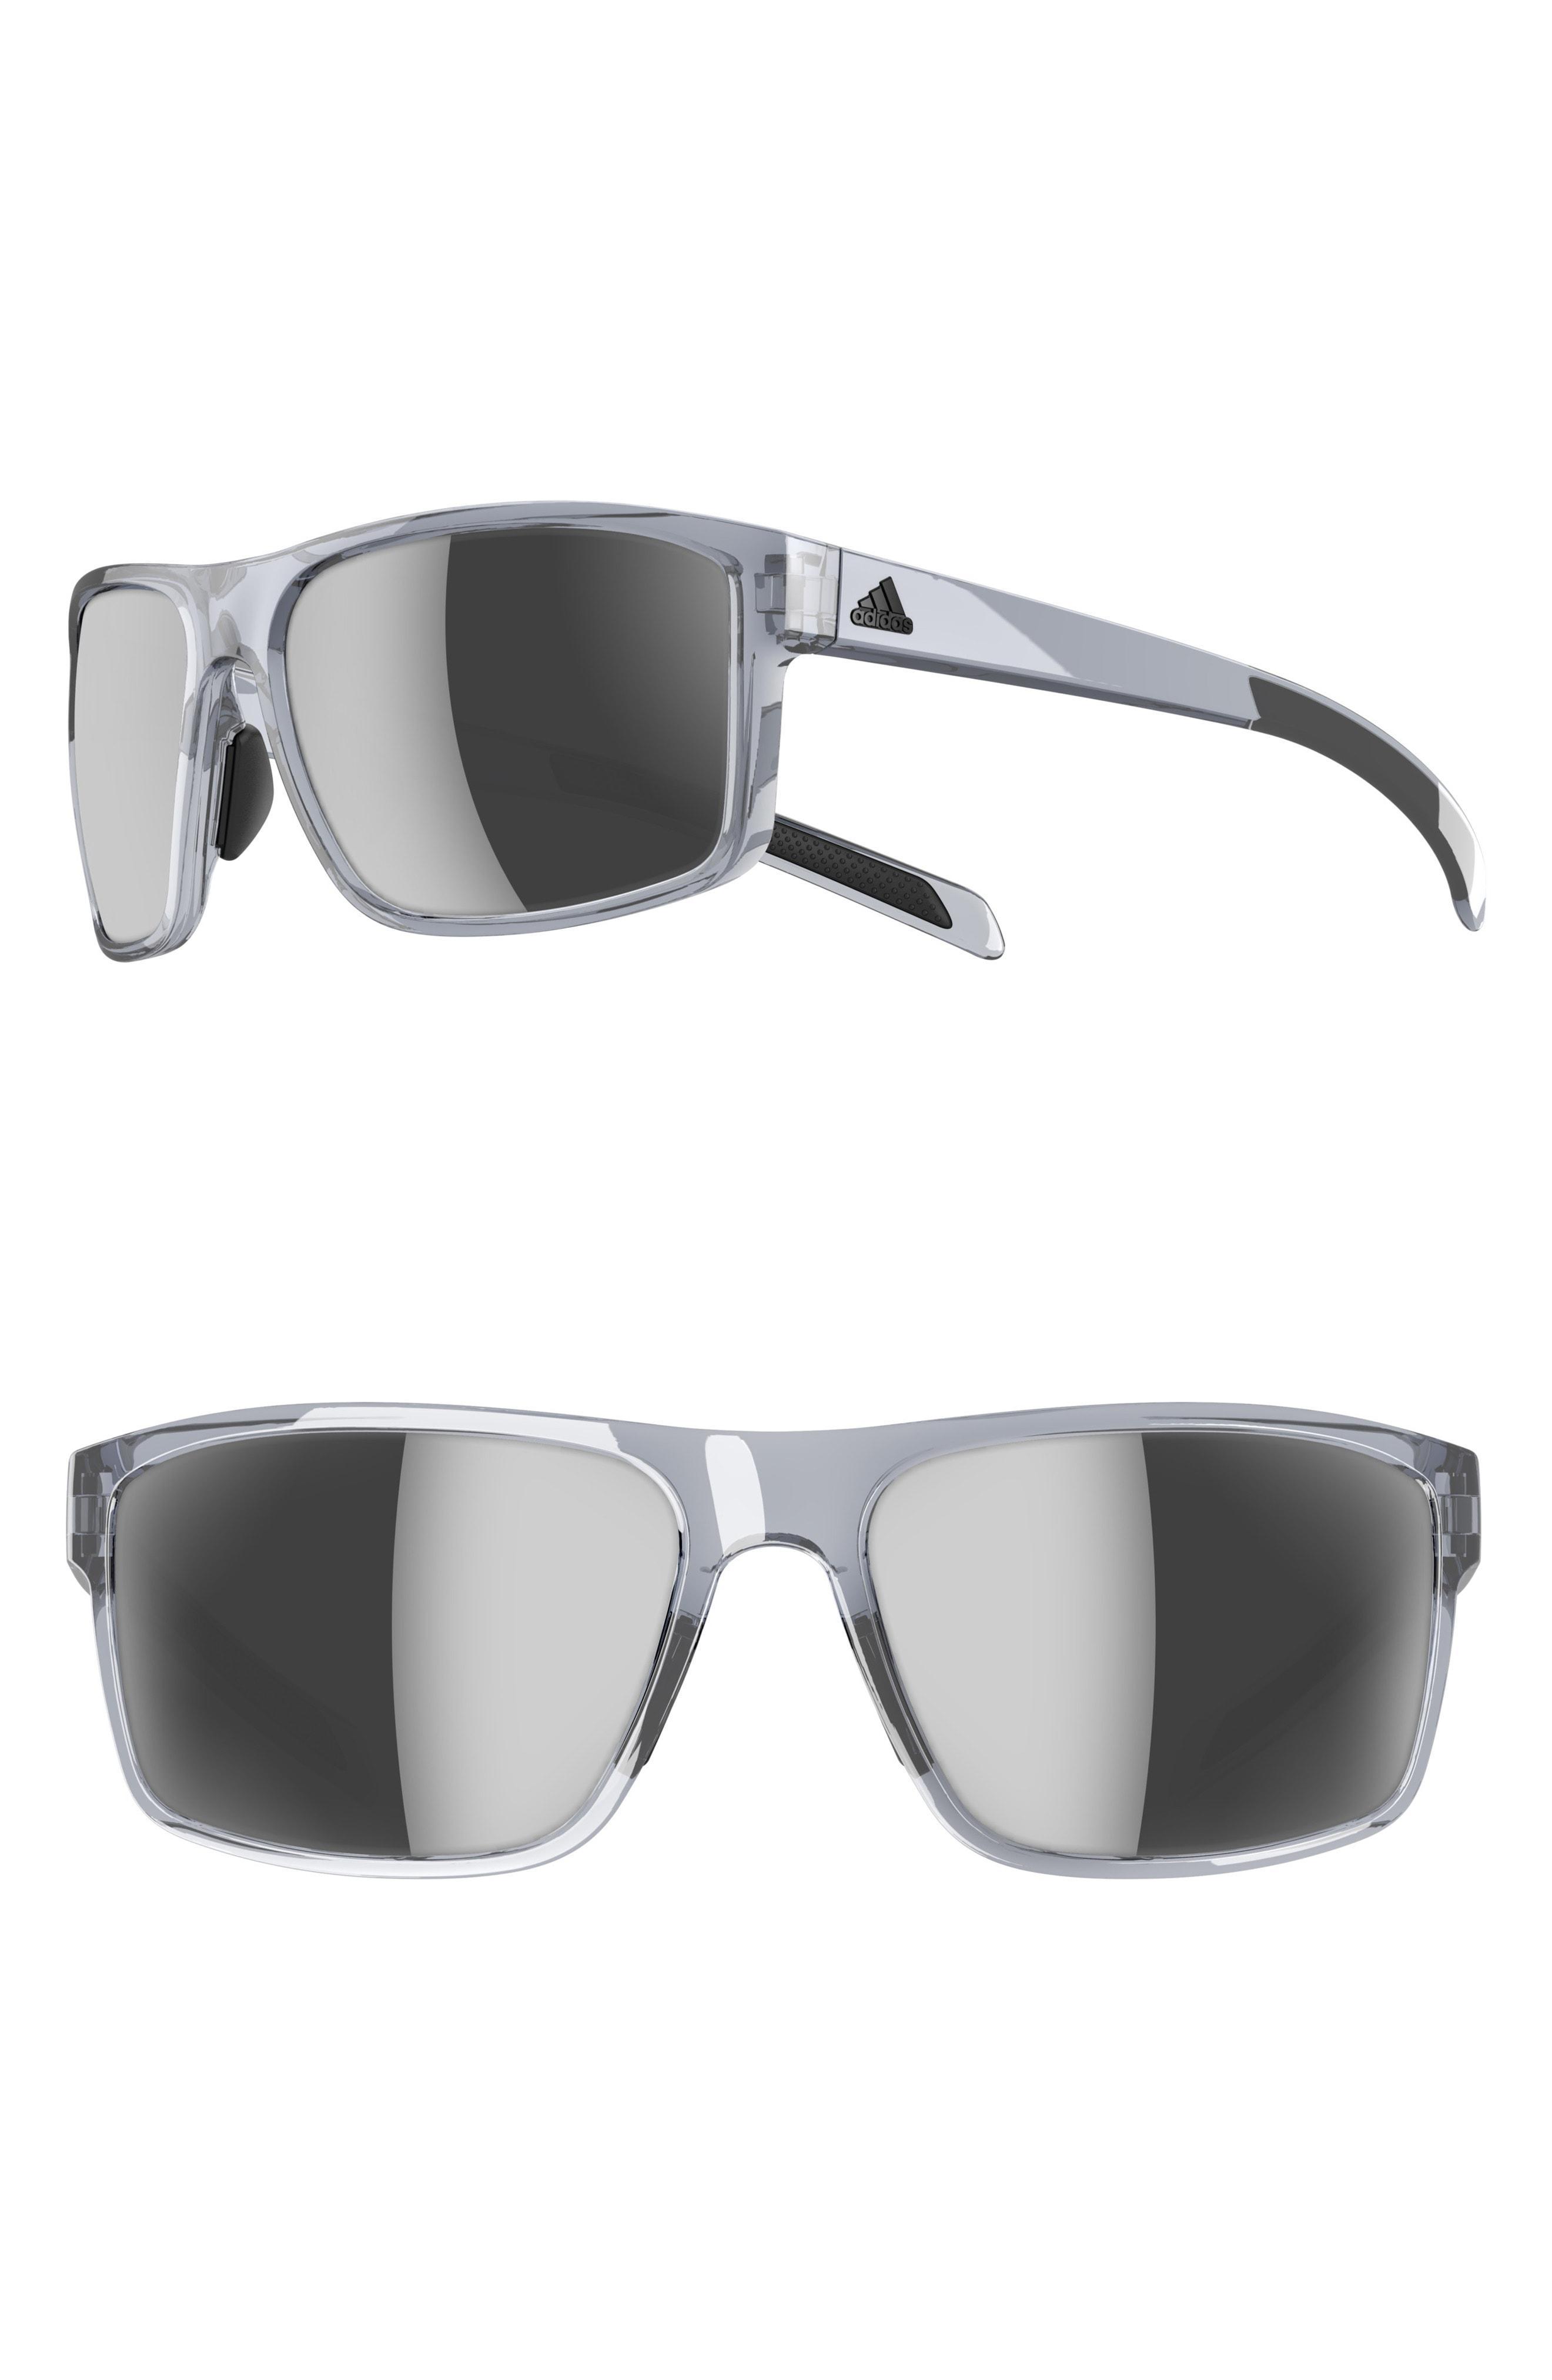 cf1dce268651 Lyst - adidas Whipstart 61mm Mirrored Sunglasses - Shiny Grey ...